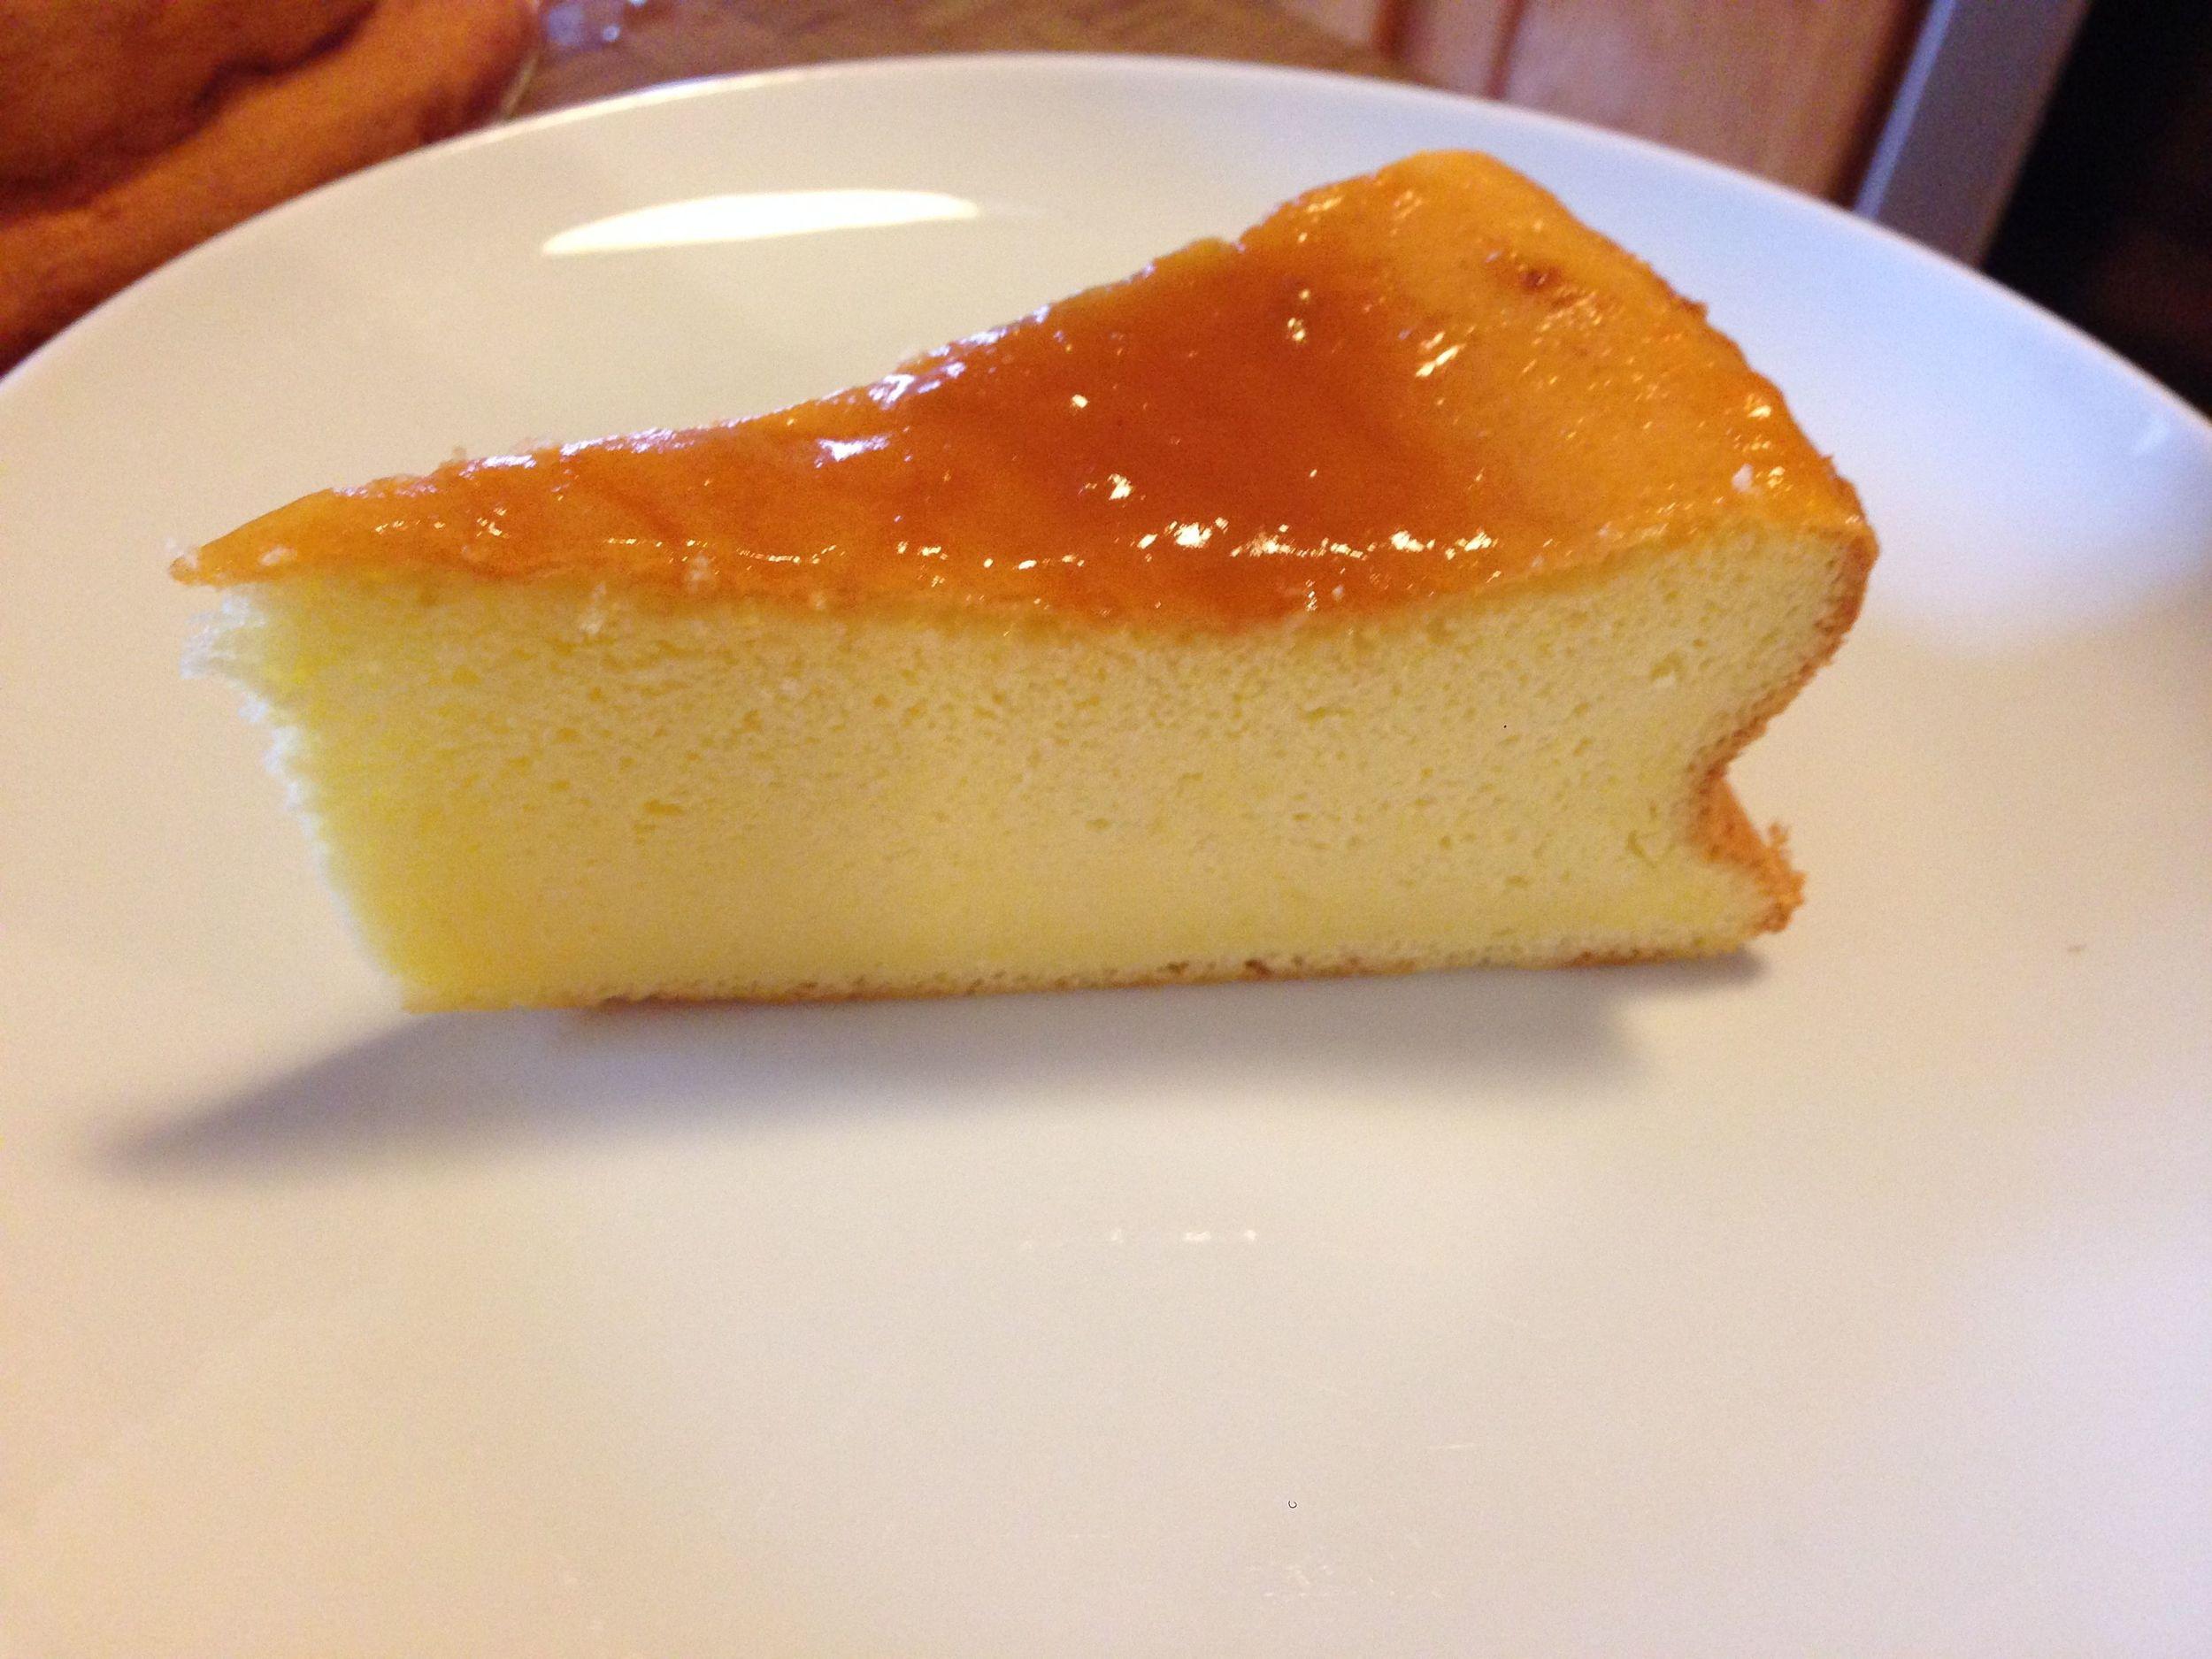 japanesecheesecake